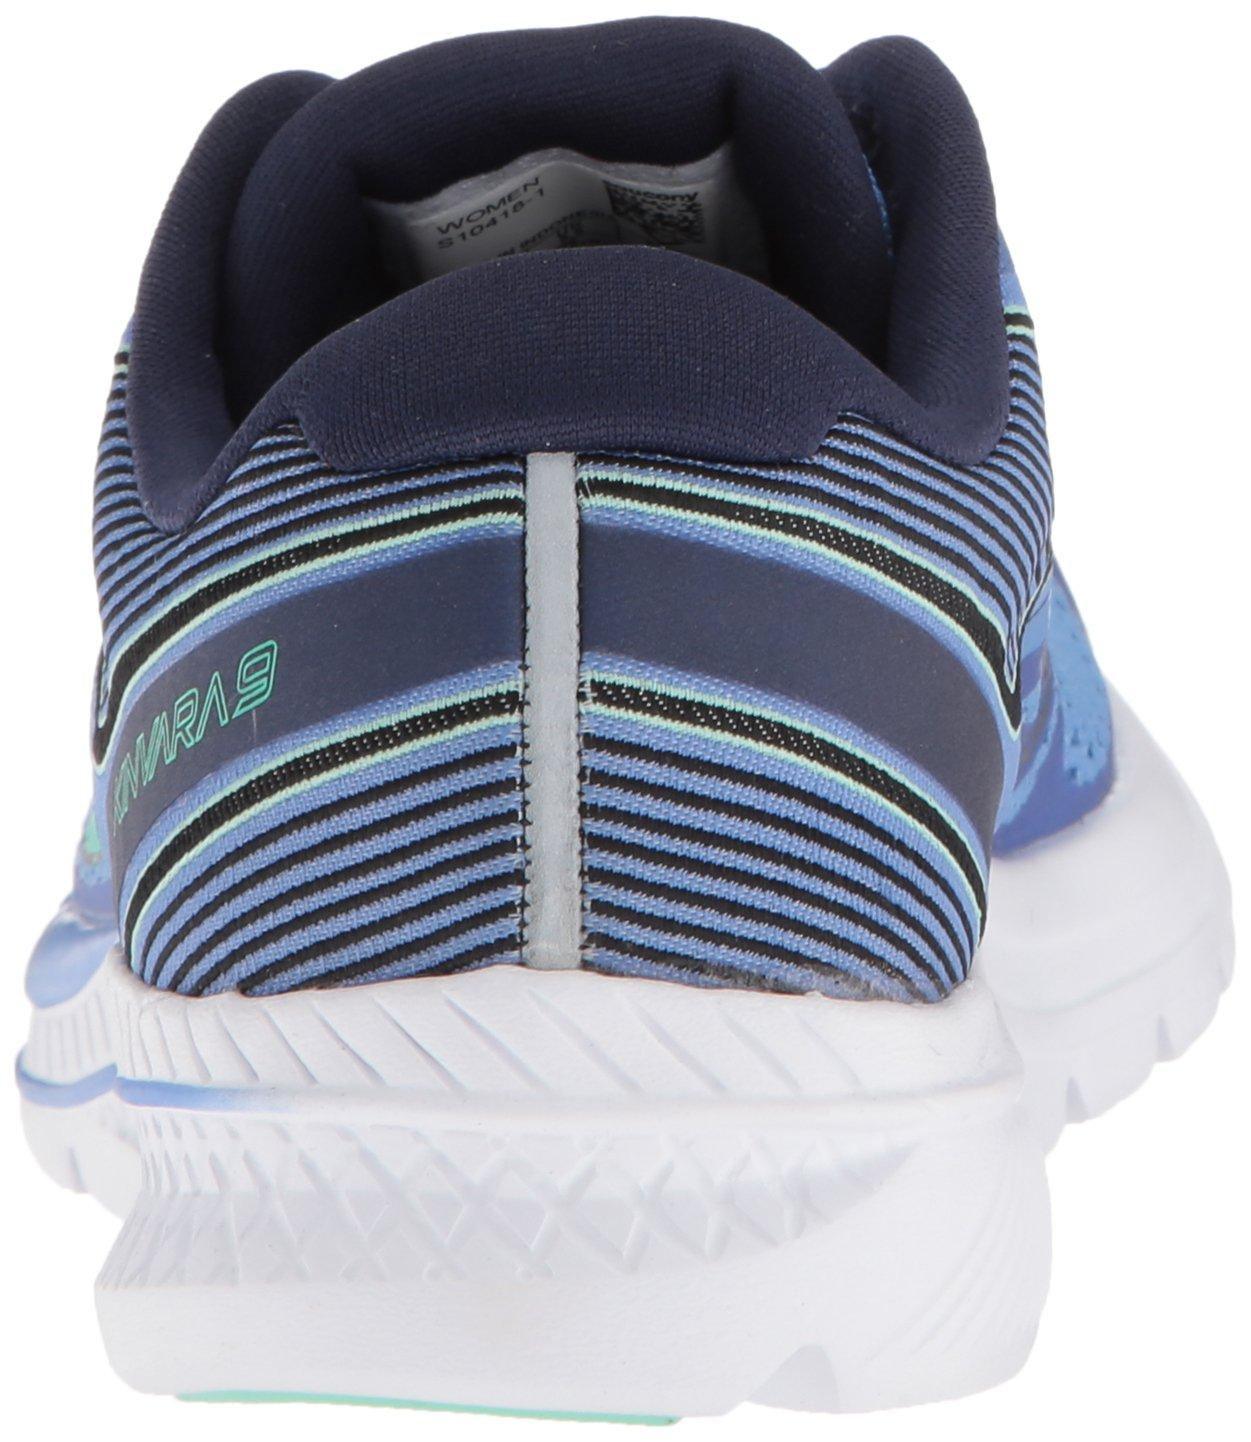 Saucony Women's Kinvara 9 Running Shoe, Blue/Teal, 9.5 Medium US by Saucony (Image #2)